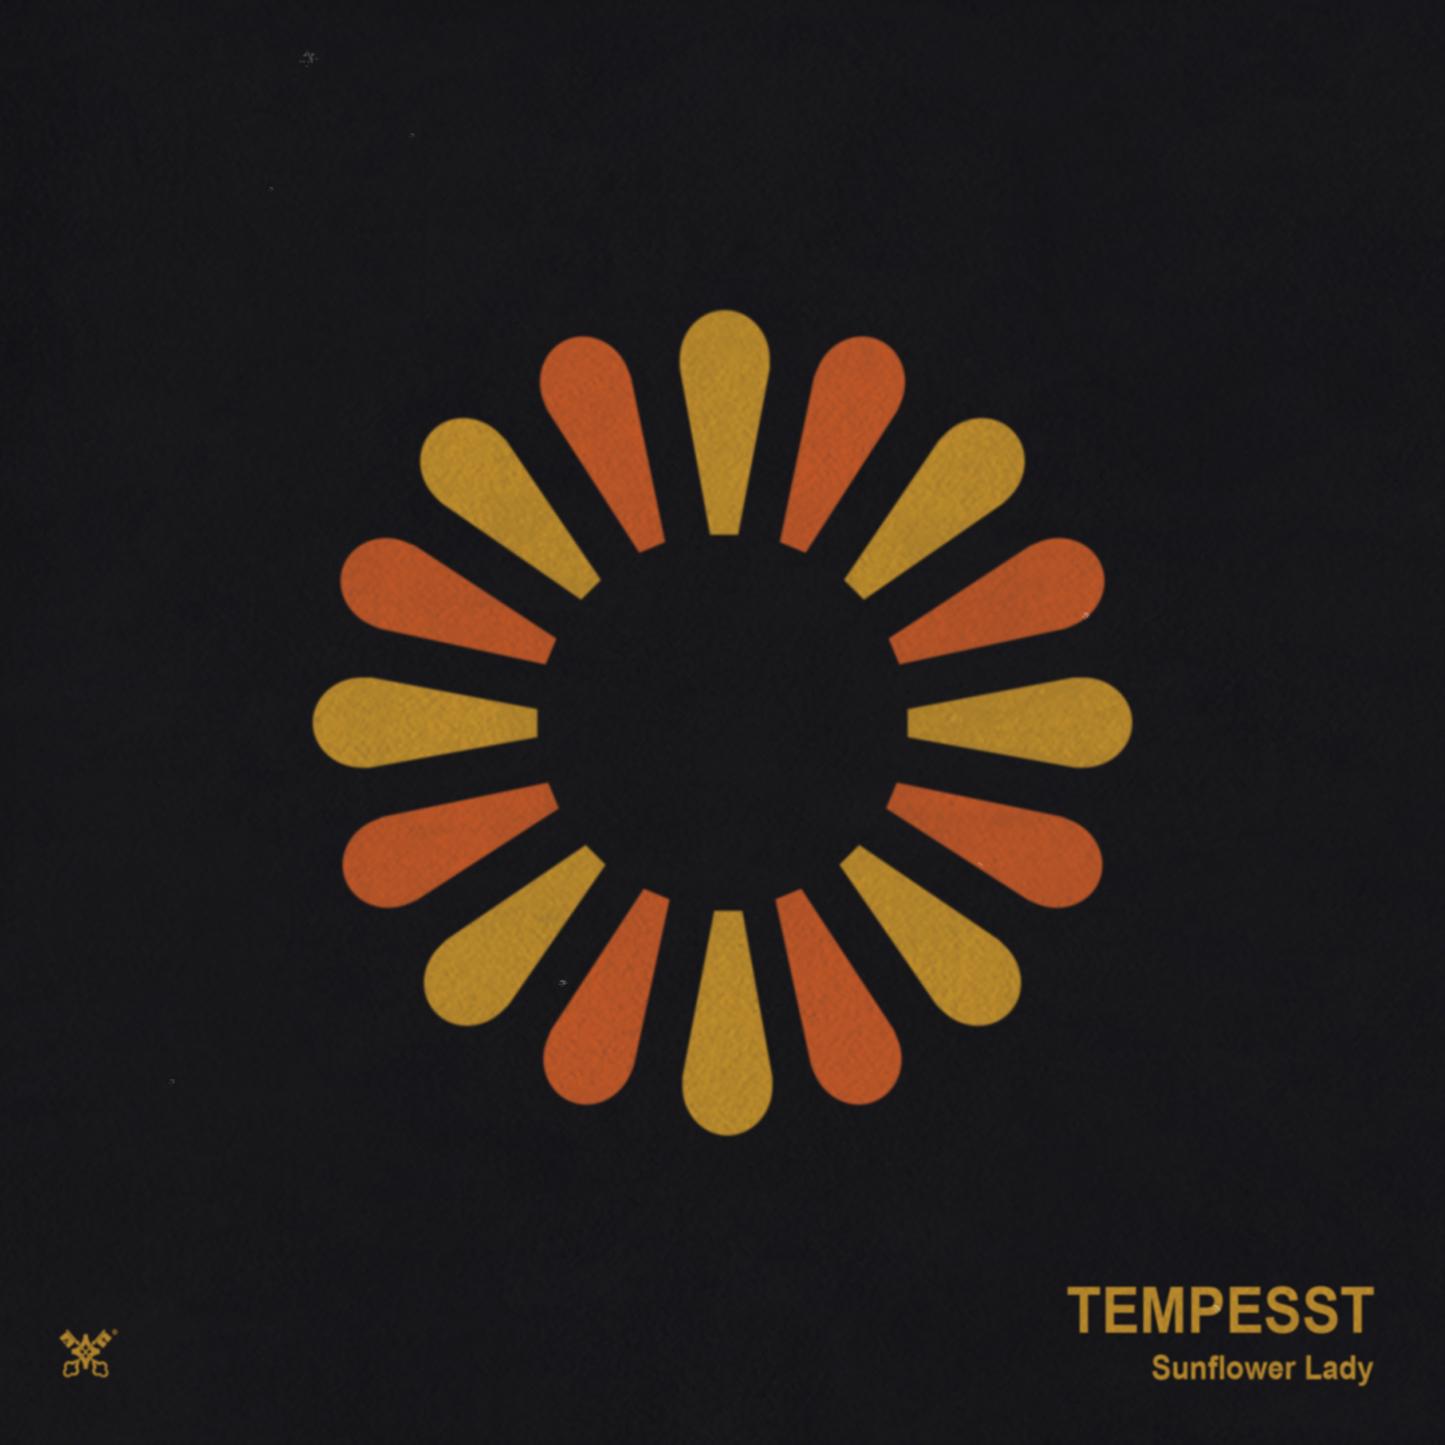 Tempesst - Sunflower Lady